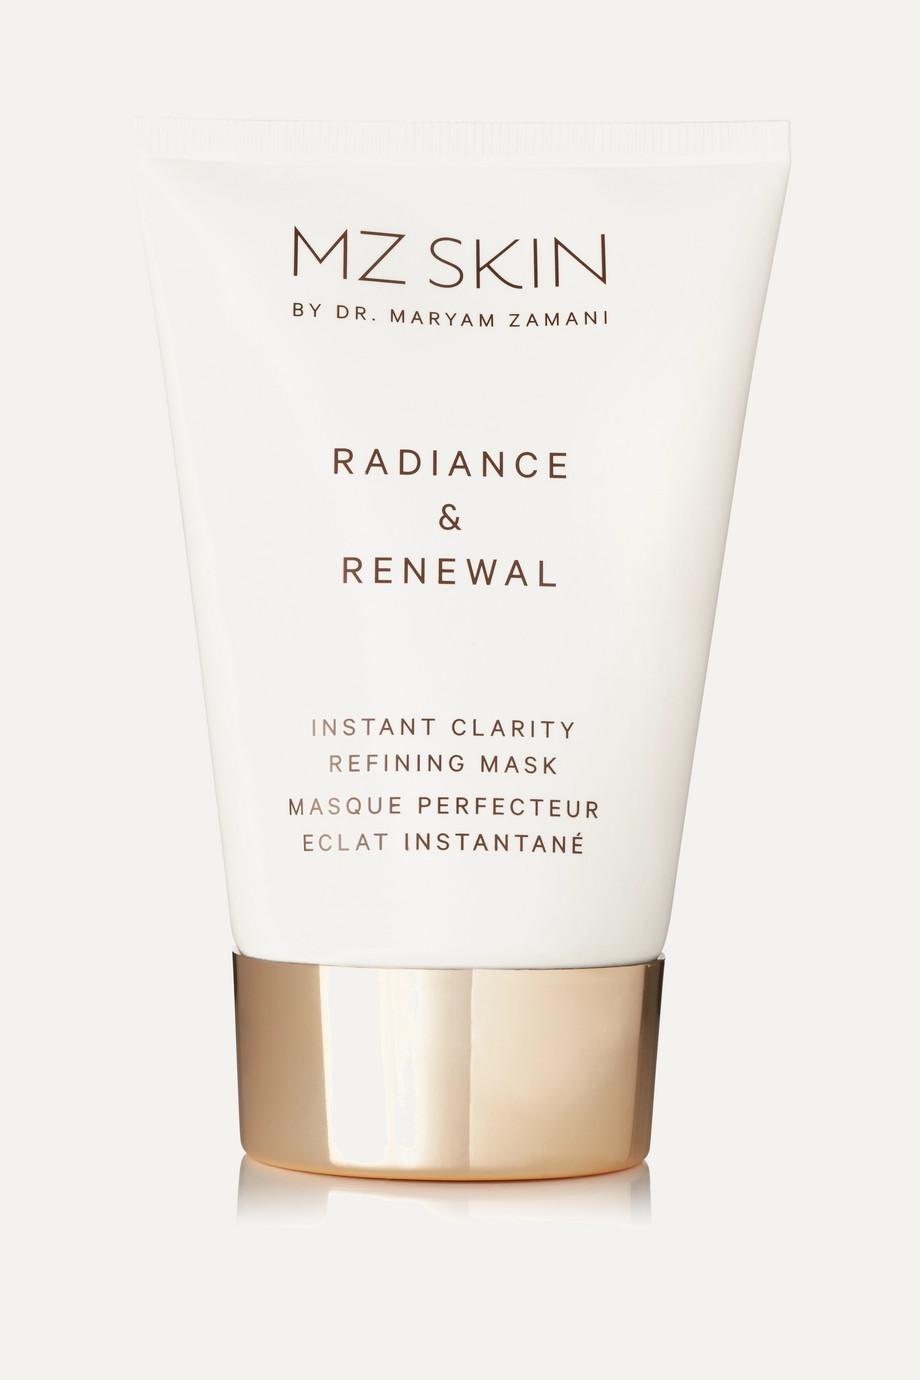 MZ Skin Radiance & Renewal Instant Clarity Refining Mask, 100 ml – Gesichtsmaske